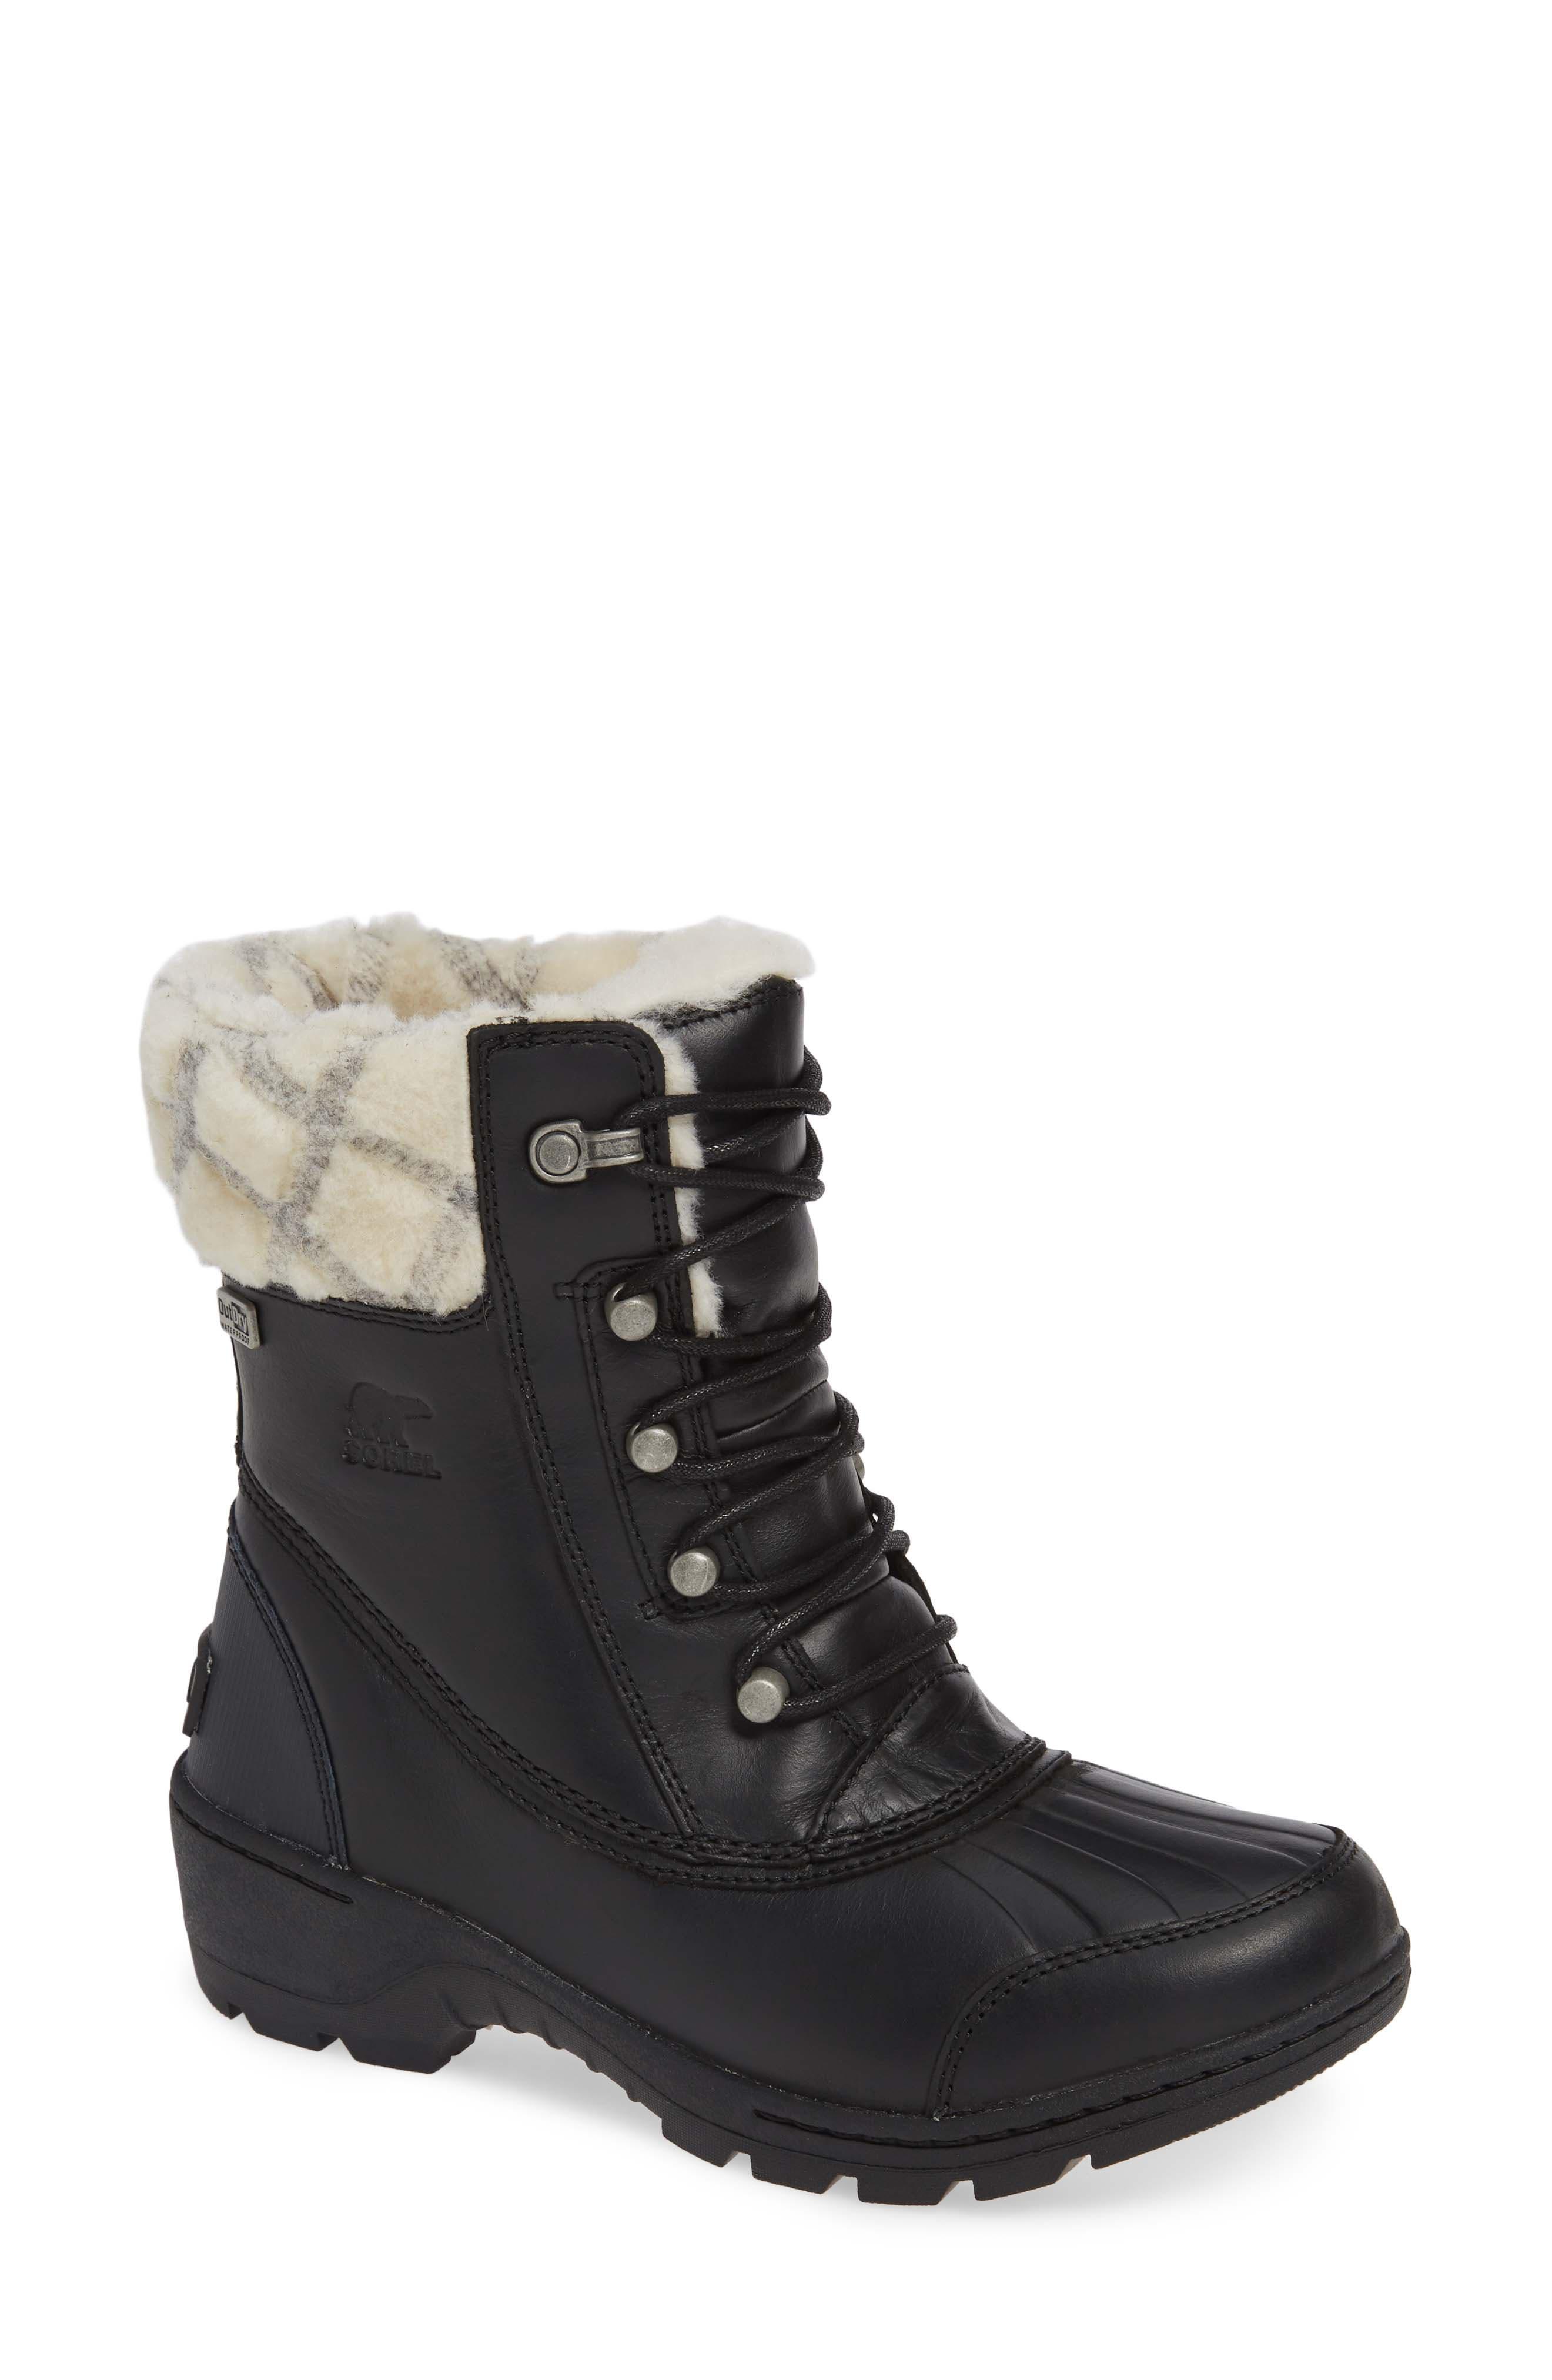 Sorel Whistler(TM) Waterproof Insulated Boot- Black